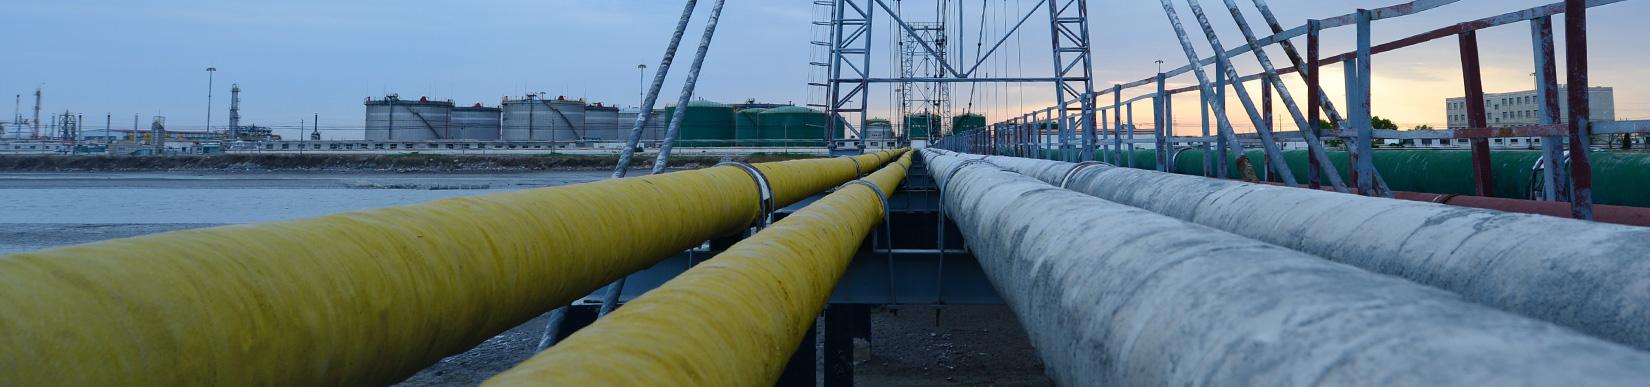 Petroleum Product Brokerage